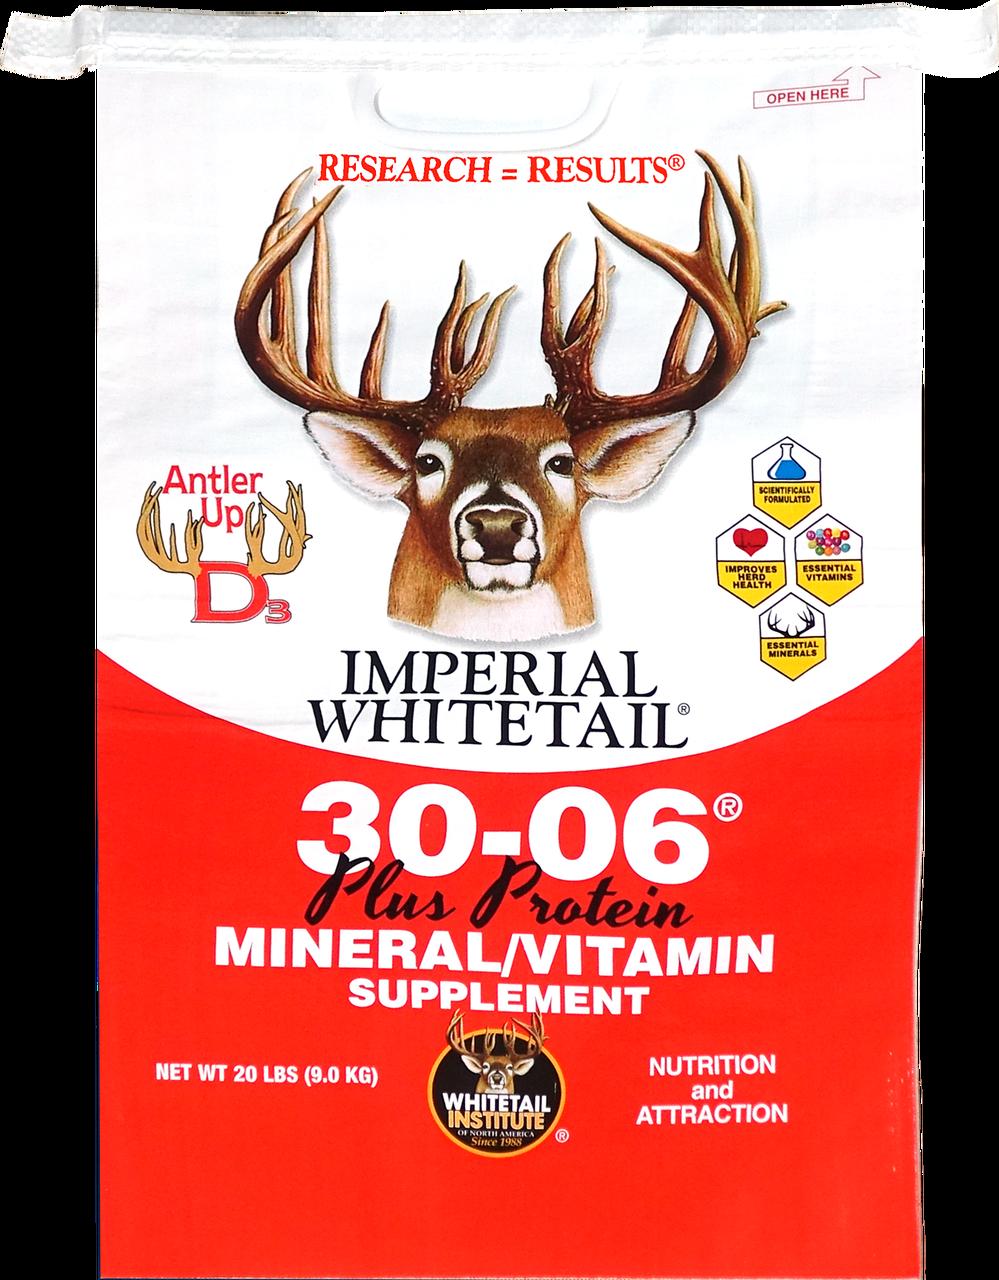 30 06 Mineral Vitamin Plus Protein Whitetail Institute